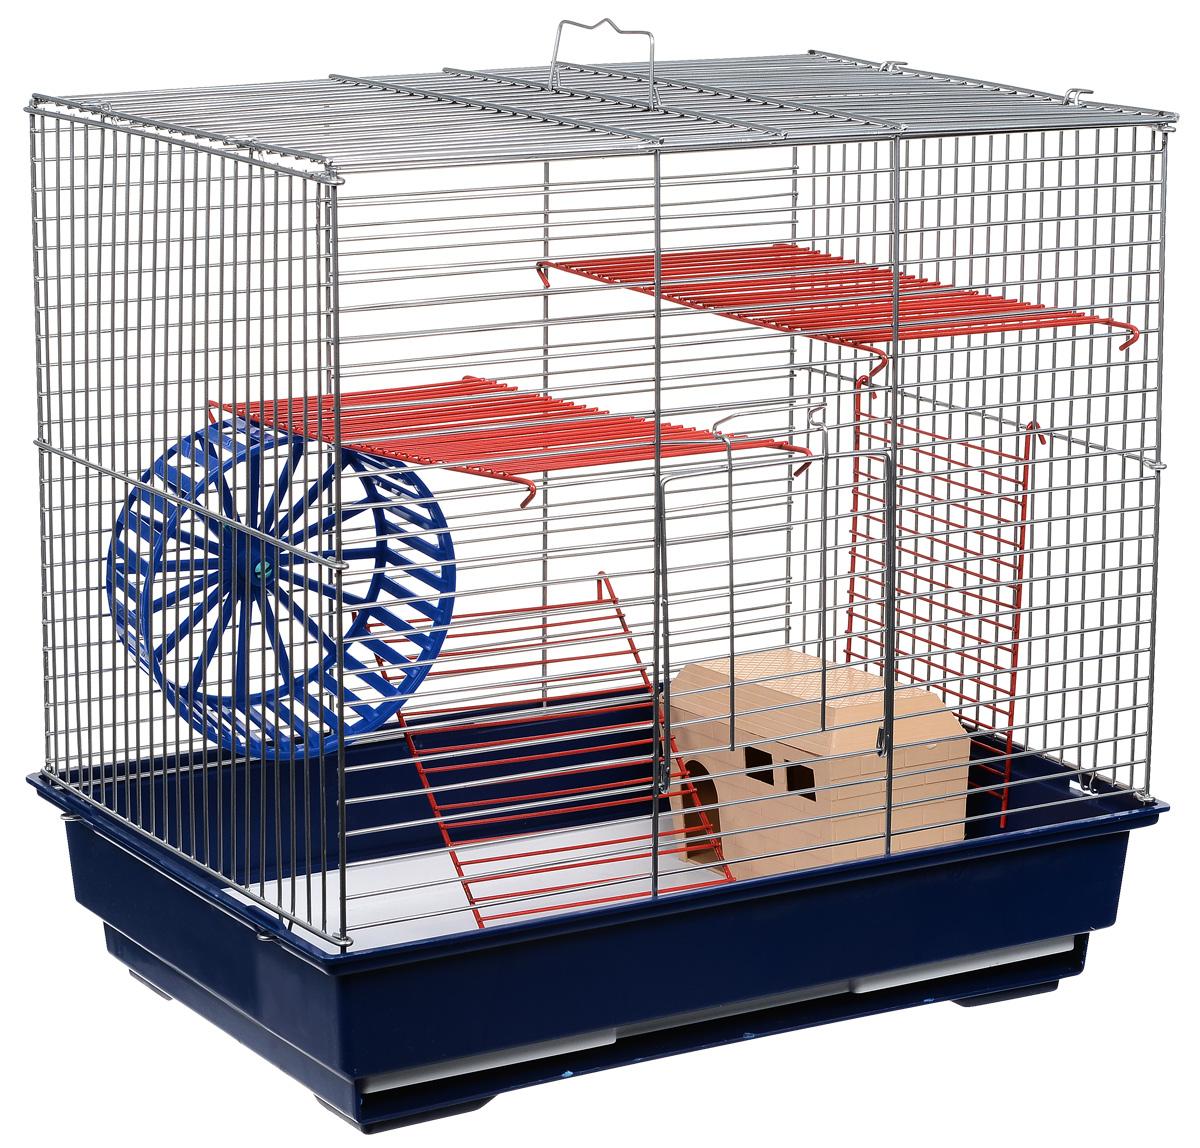 Клетка для грызунов Велес Lusy 3, 3-этажная, разборная, цвет: синий, 42 х 42 х 30 см клетка для грызунов велес lusy 2 2 этажная цвет красный 30 х 42 х 25 см